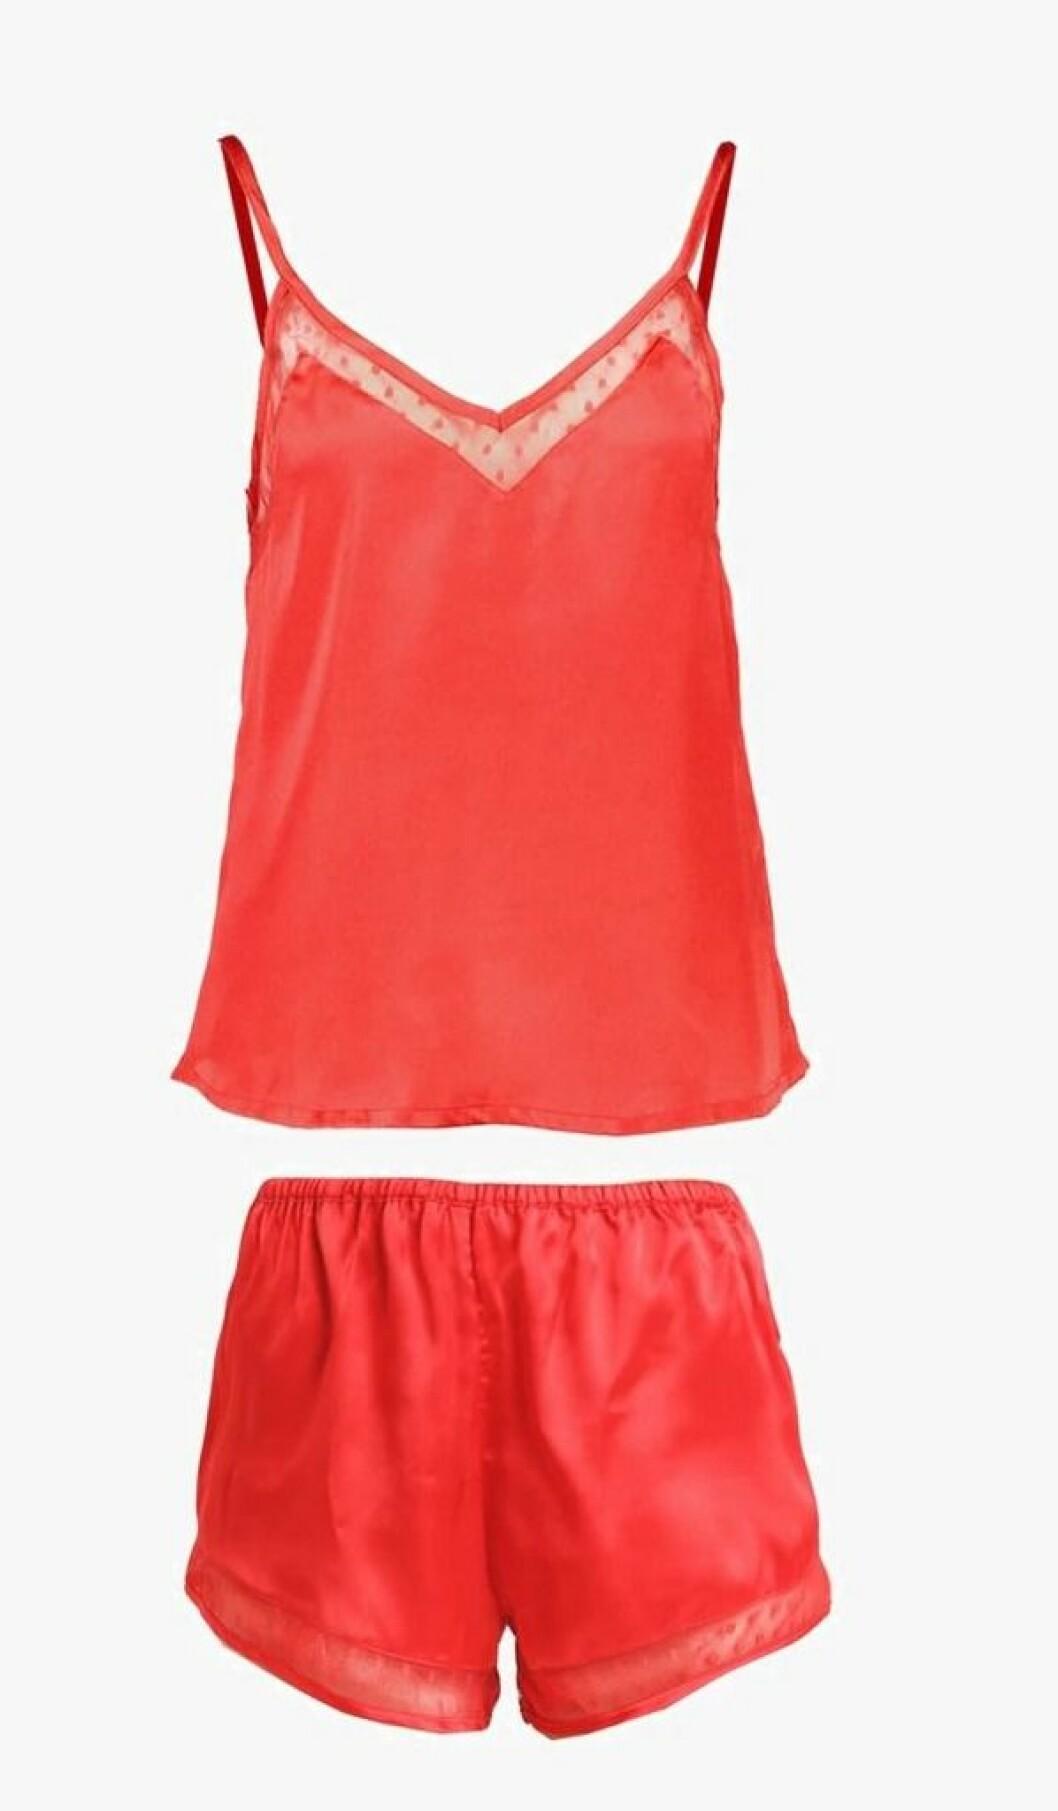 Pysj fra Dorothy Perkins |279,-| https://www.zalando.no/dorothy-perkins-spot-cami-pyjamas-red-dp581p00z-g11.html